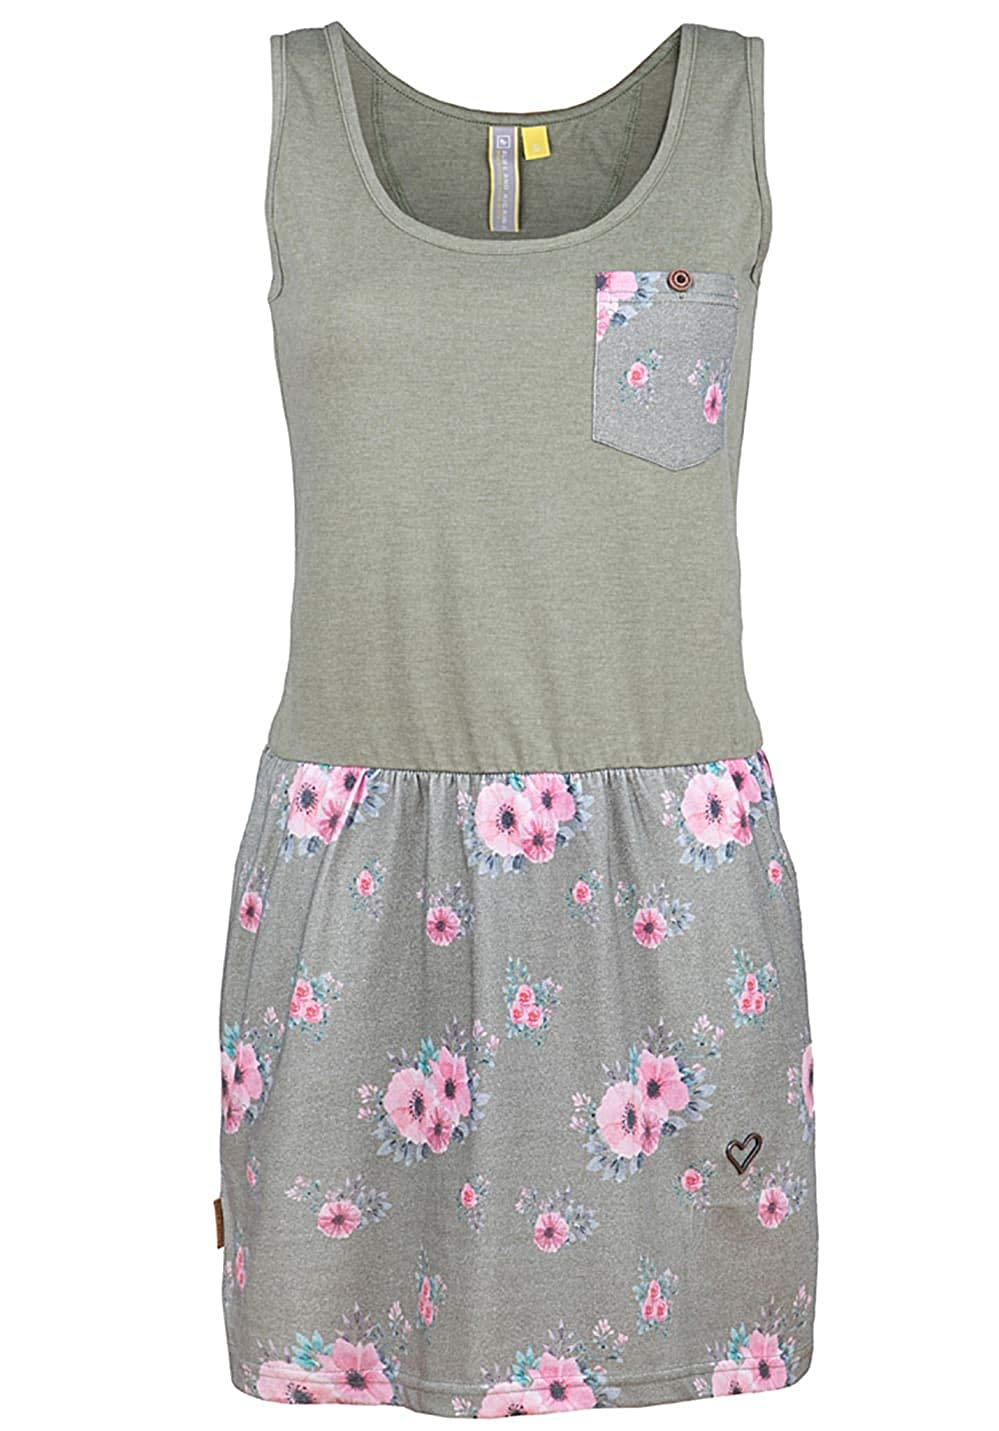 alife and Kickin Rosalie Dress Damen Sommerkleid, Jerseykleid, Strandkleid, Kleid